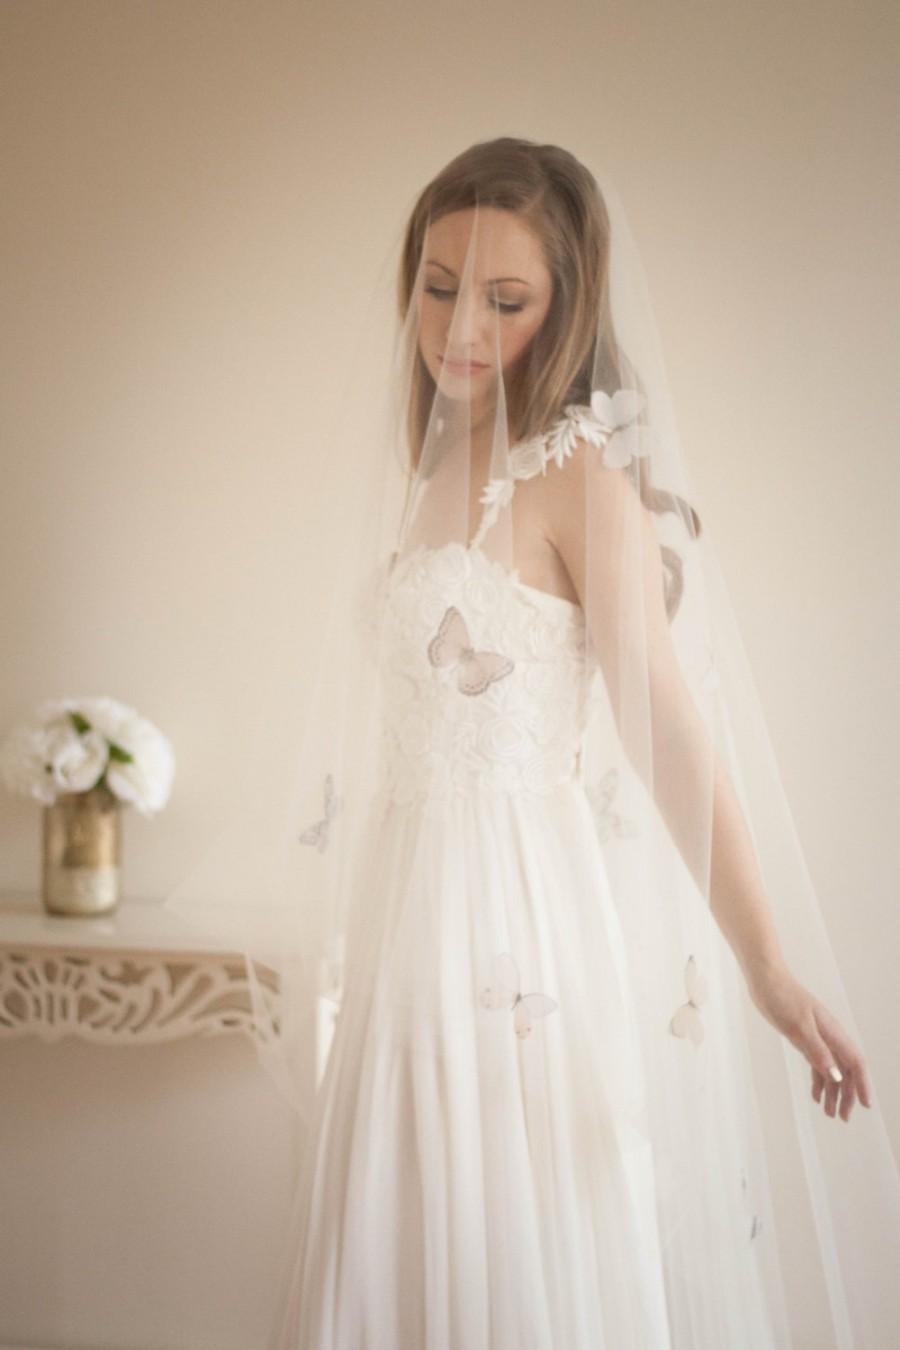 Wedding - Butterfly veil, elbow, fingertip, knee, waltz, floor, chapel or cathedral length, Blush veil, diamond white, cathedral veil chapel veil #308